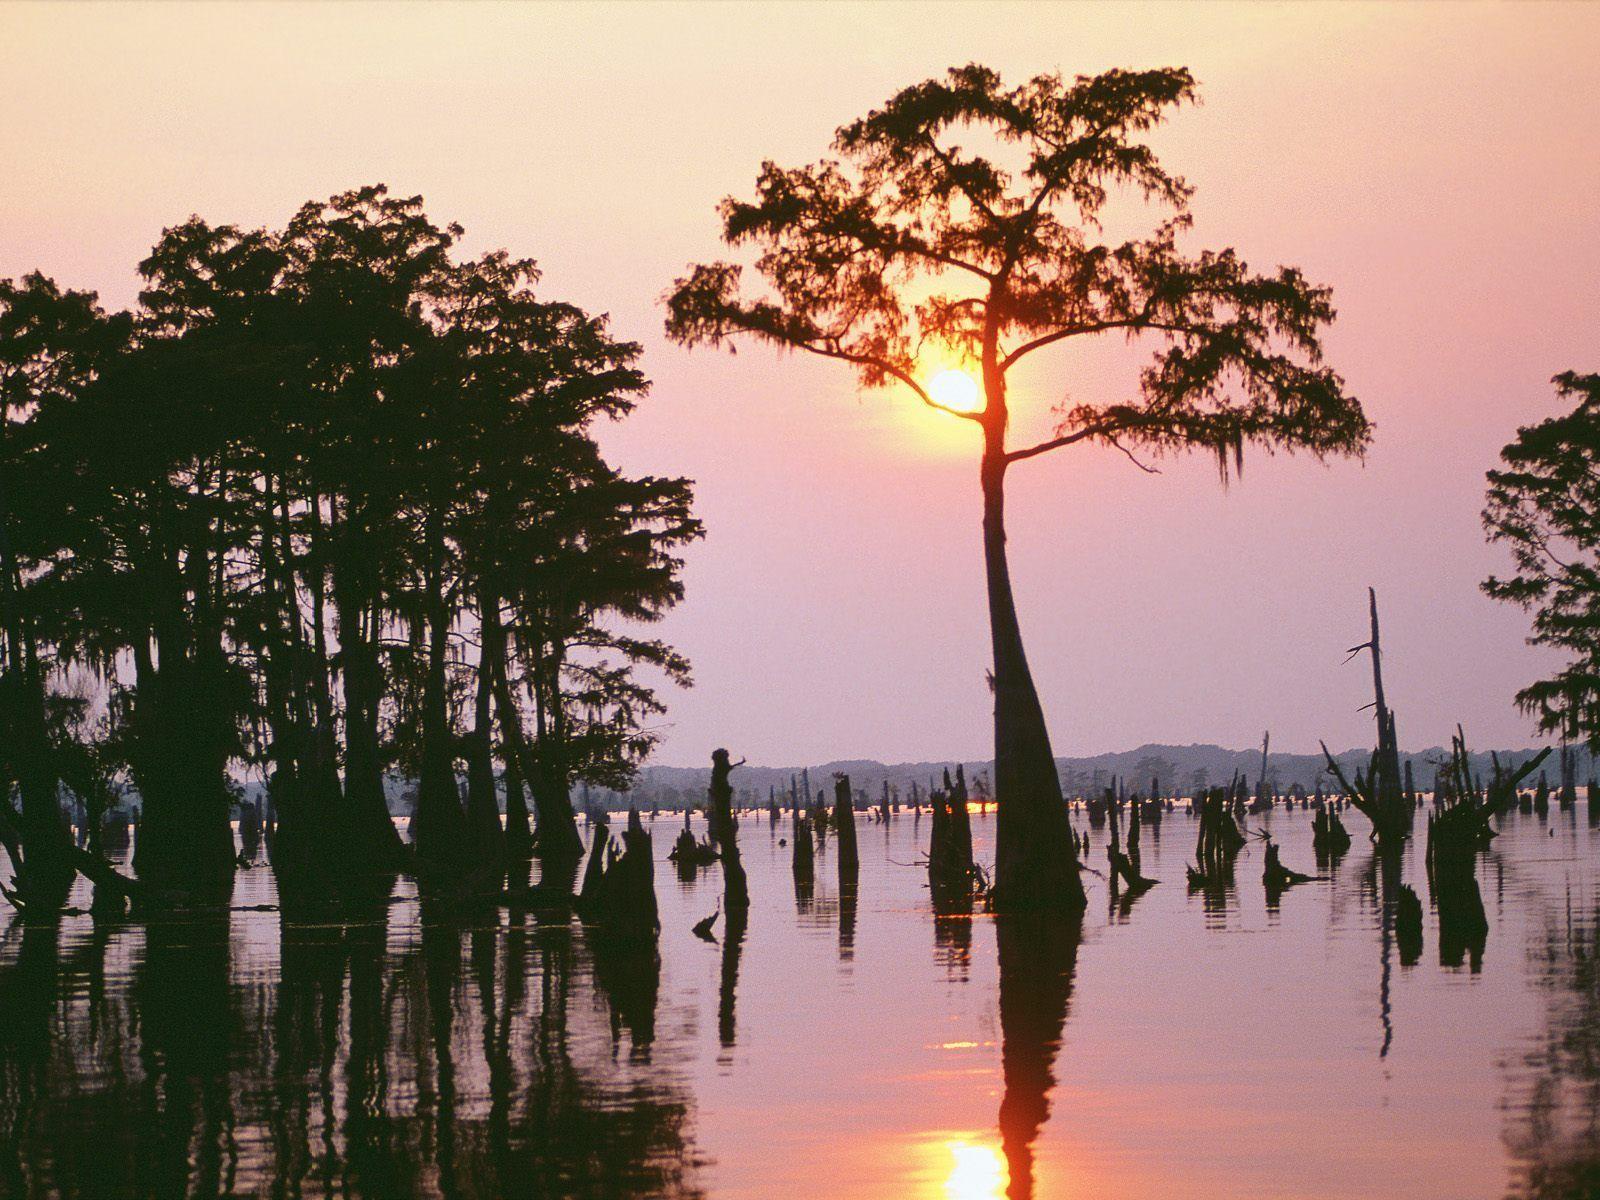 55 Bayou Sunset Wallpapers   Download at WallpaperBro 1600x1200